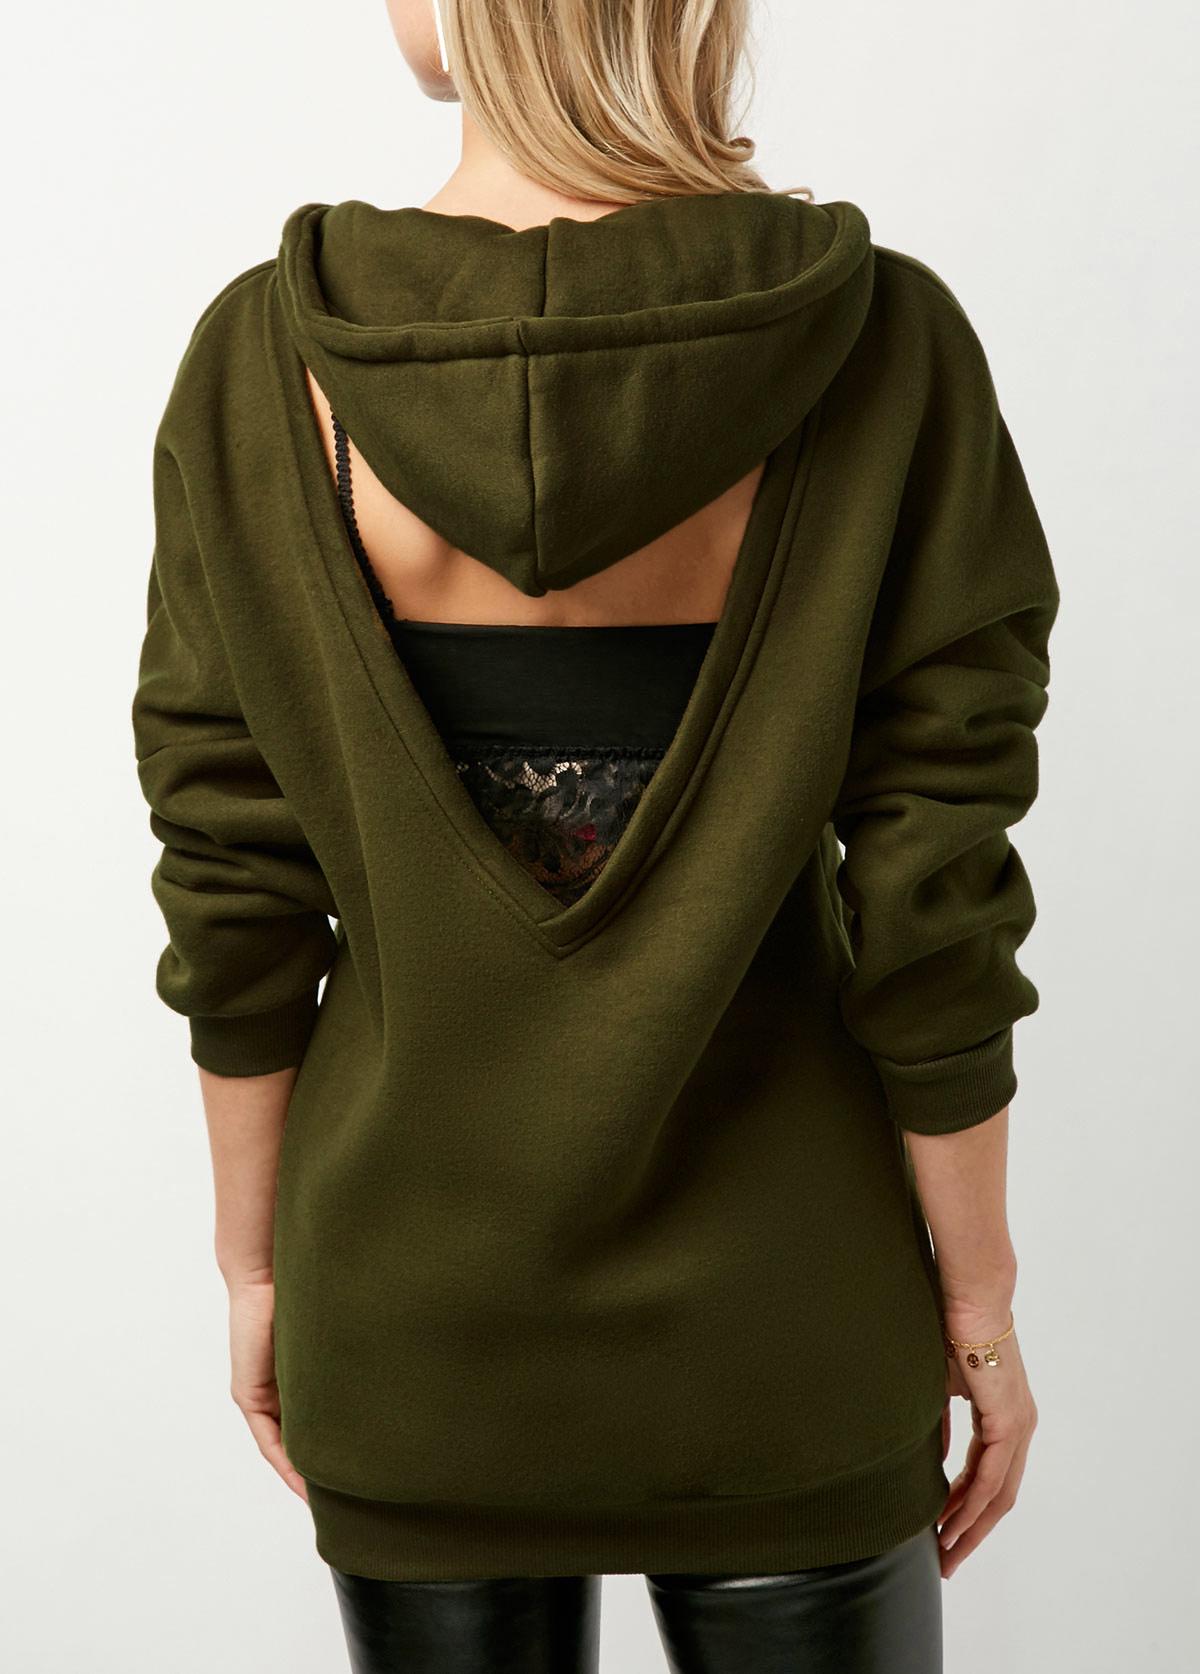 Long Sleeve Army Green Cutout Back Drawstring Hoodie